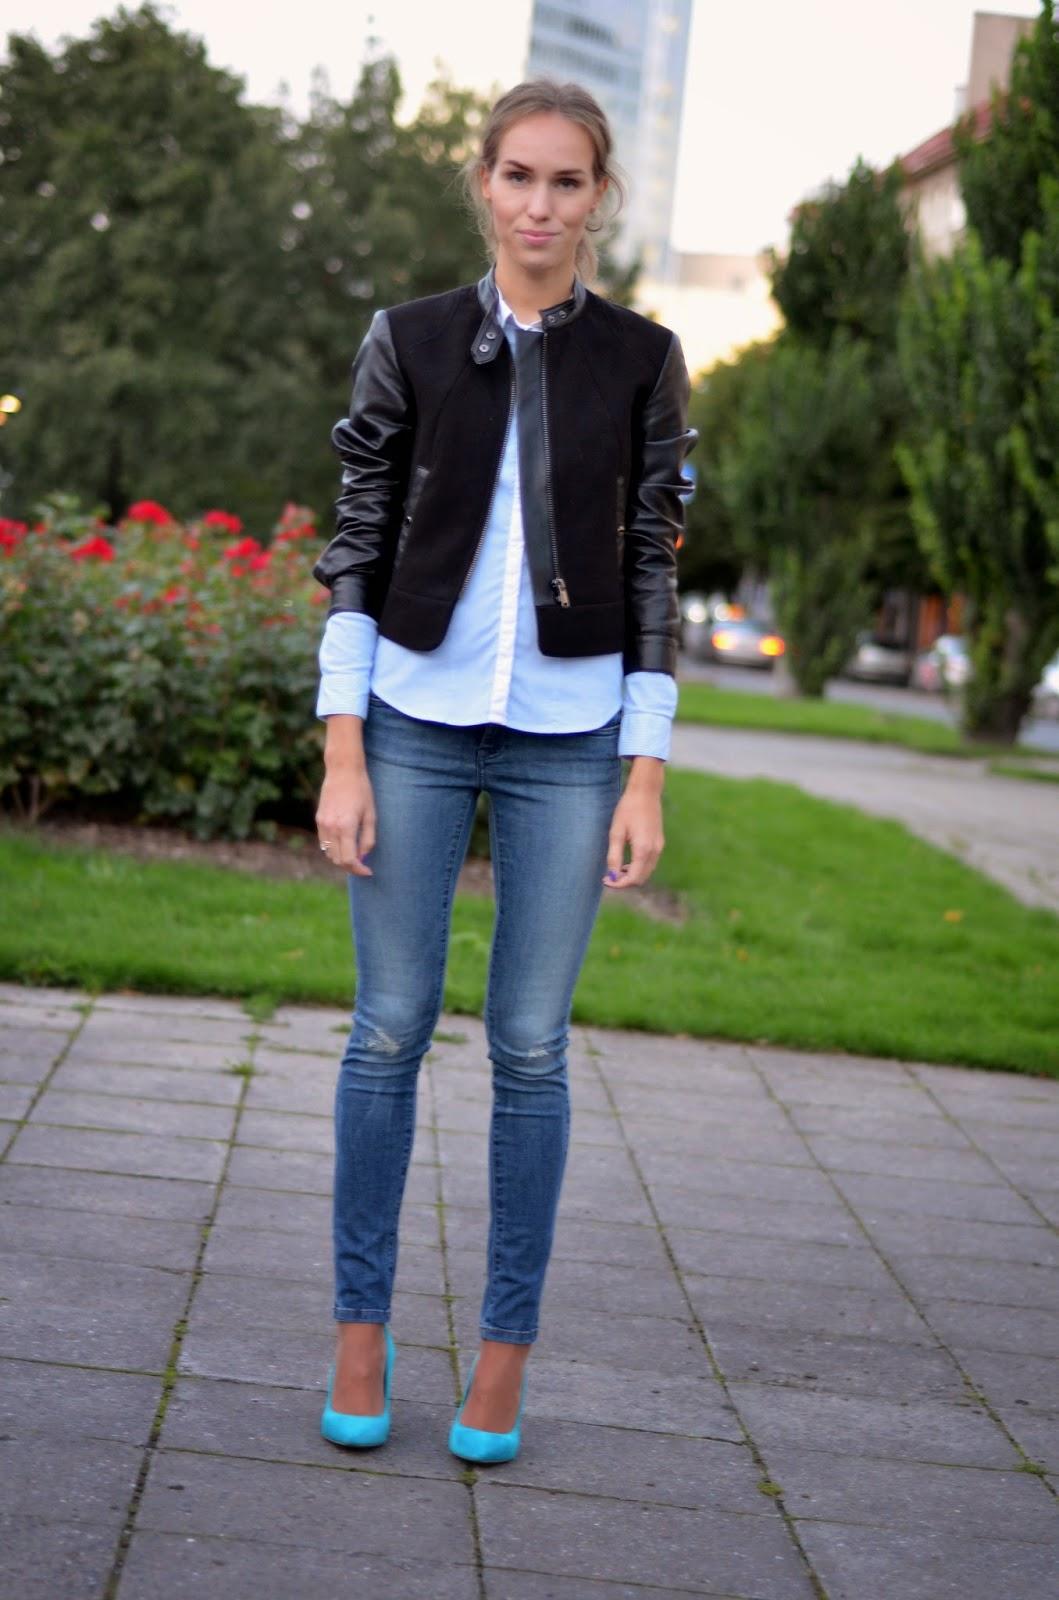 hm-shirt-biker-jacket-zara-ripped-skinny-jeans-river-island-shoes